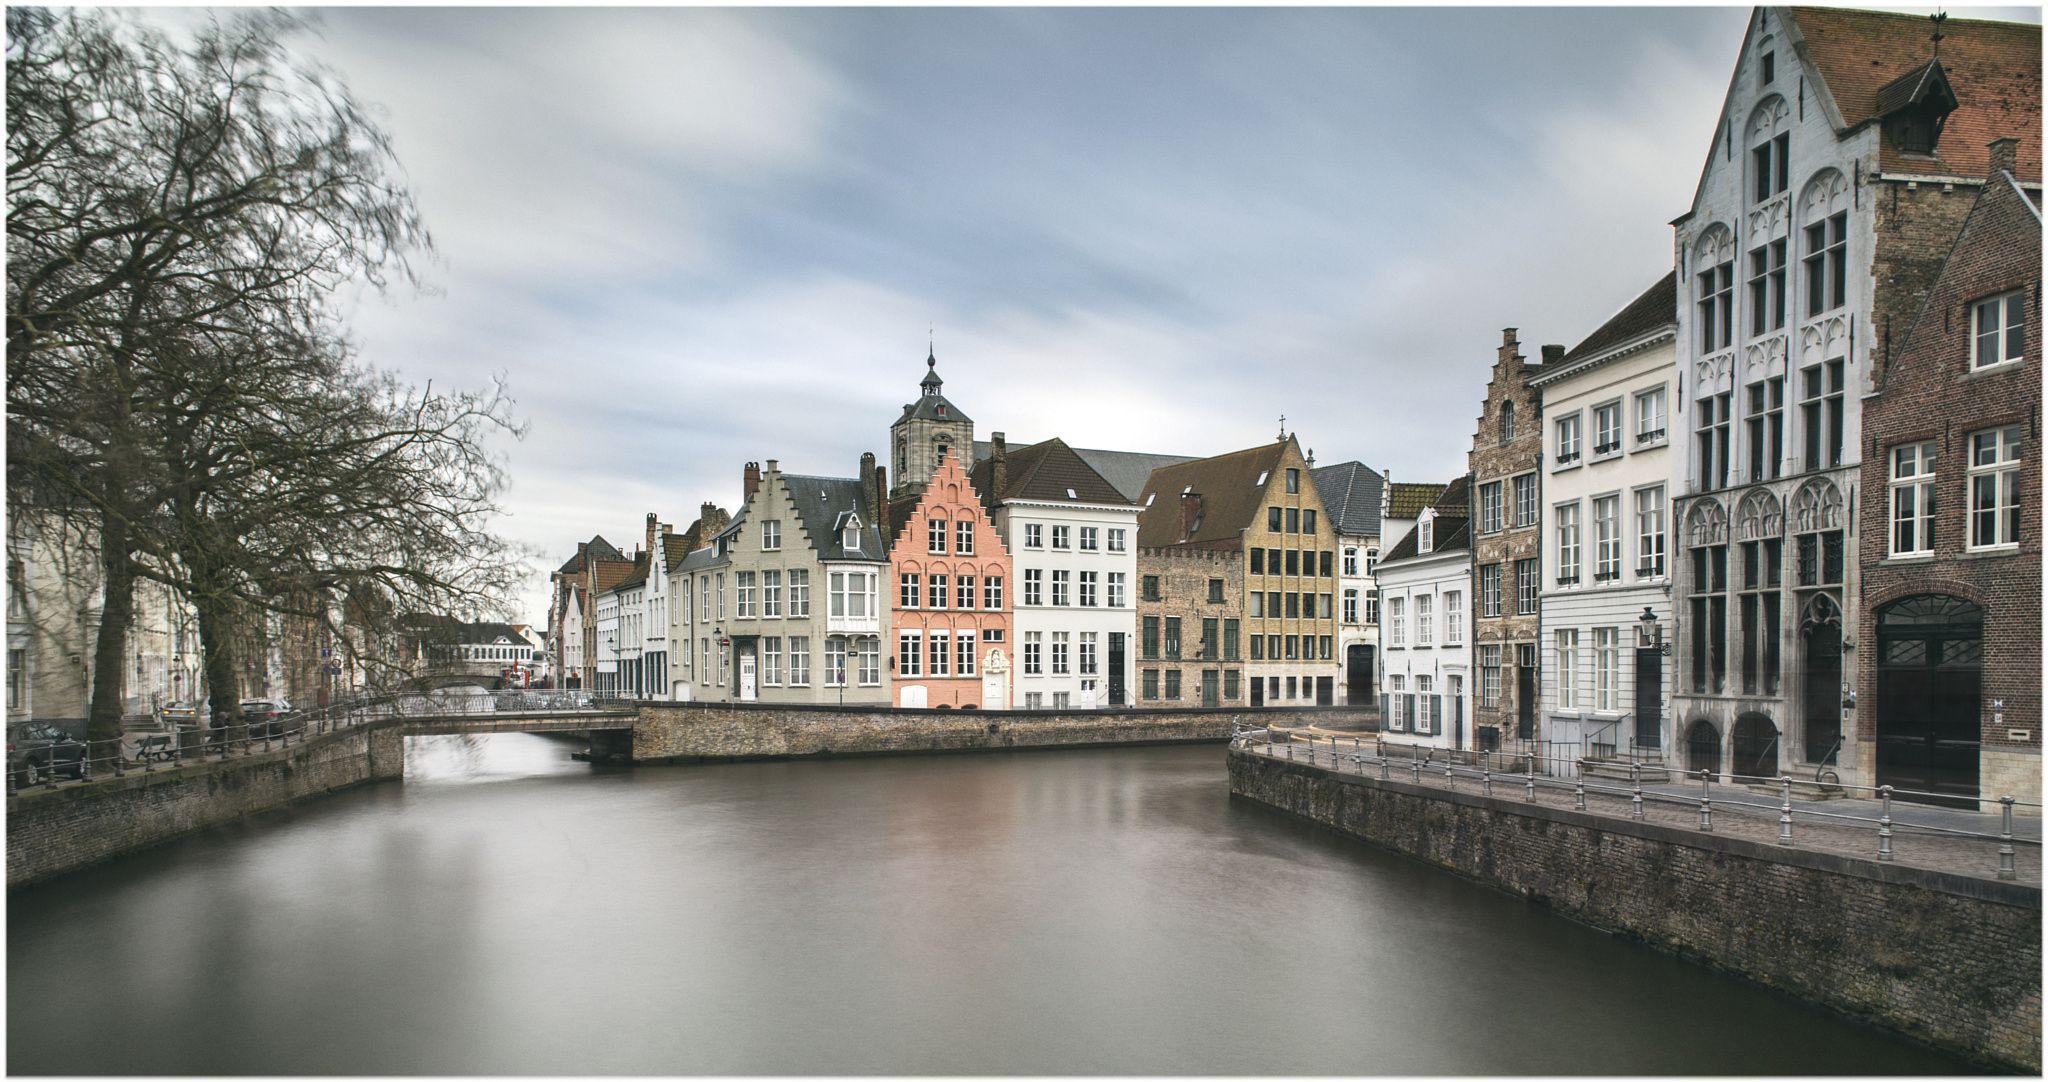 Brugge by Patrick Desmet on 500px